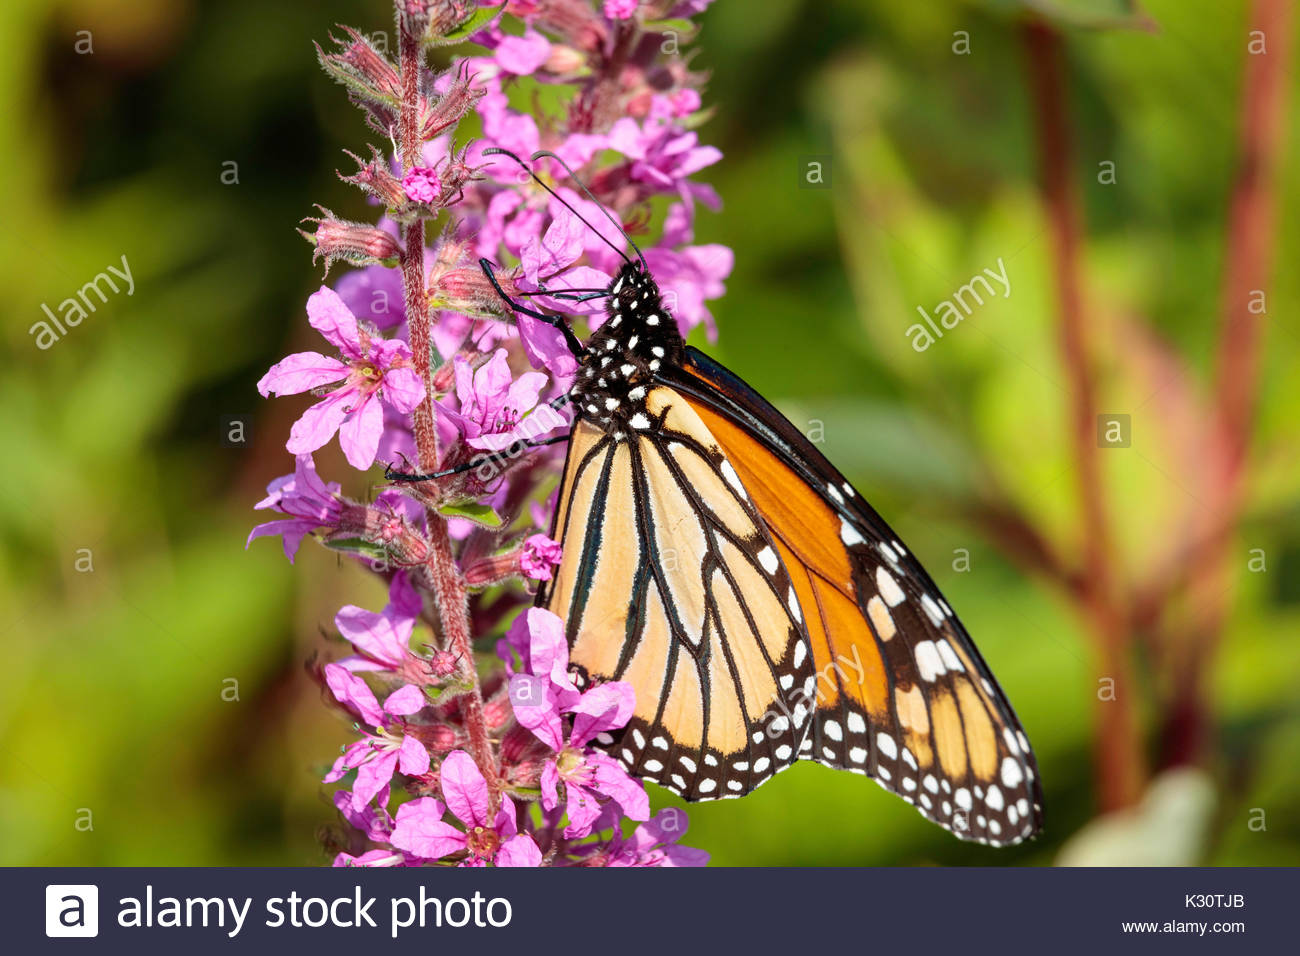 Monarch Butterfly Danaus plexippus nectaring feeding on Lythrum salicaria in Eastpoint Park in Toronto Ontario Canada - Stock Image